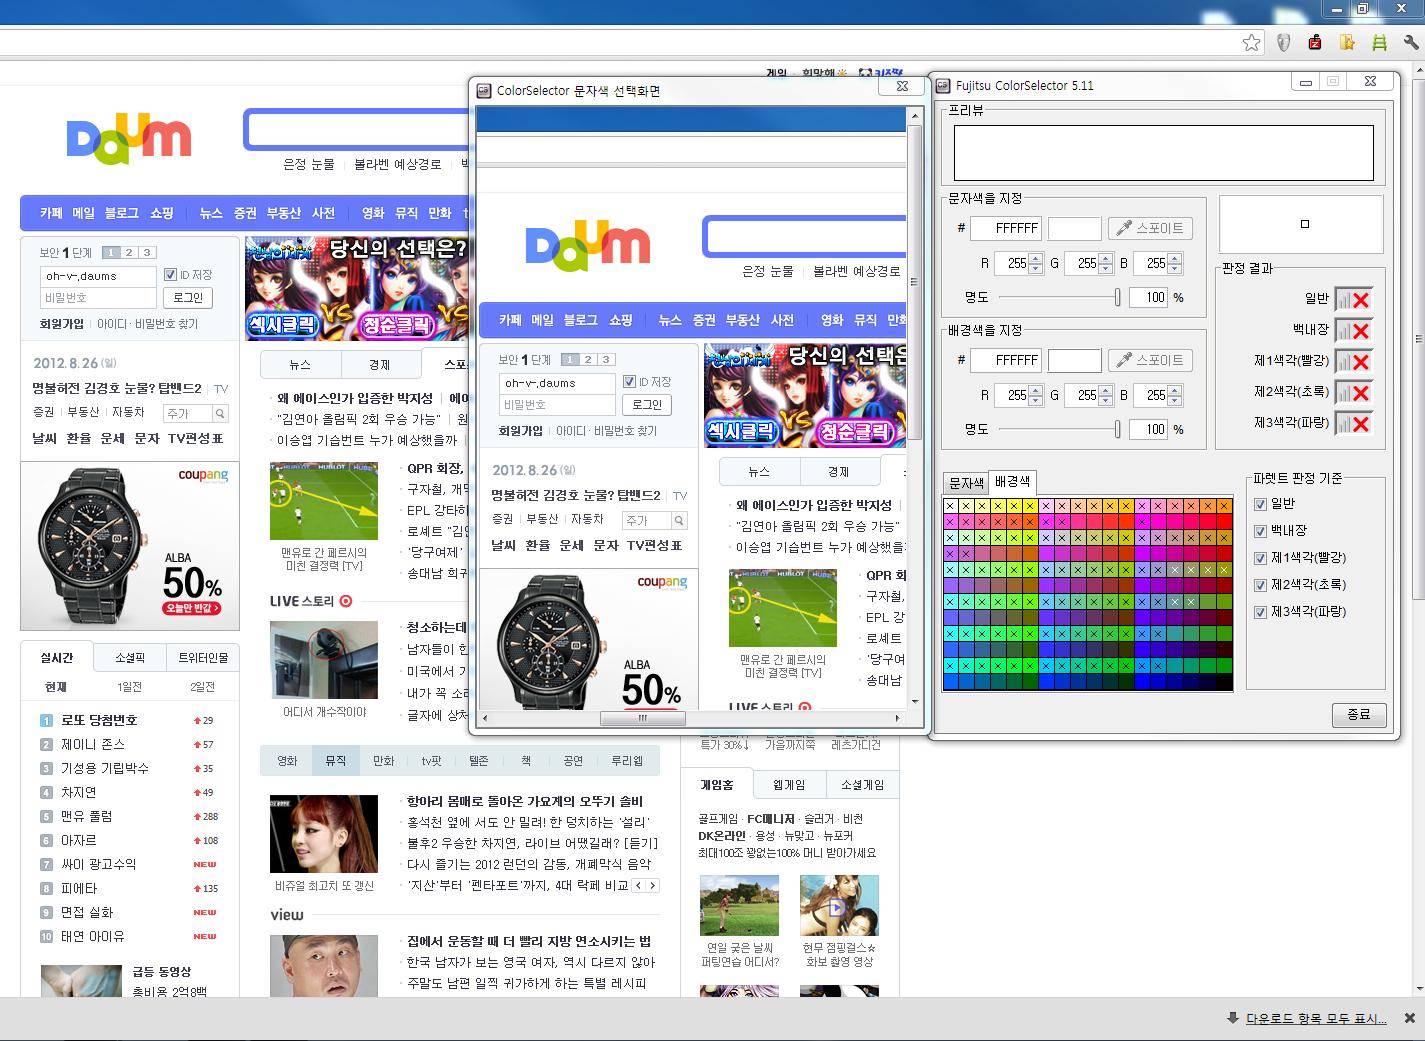 ColorSelector 사용 방법  화면5